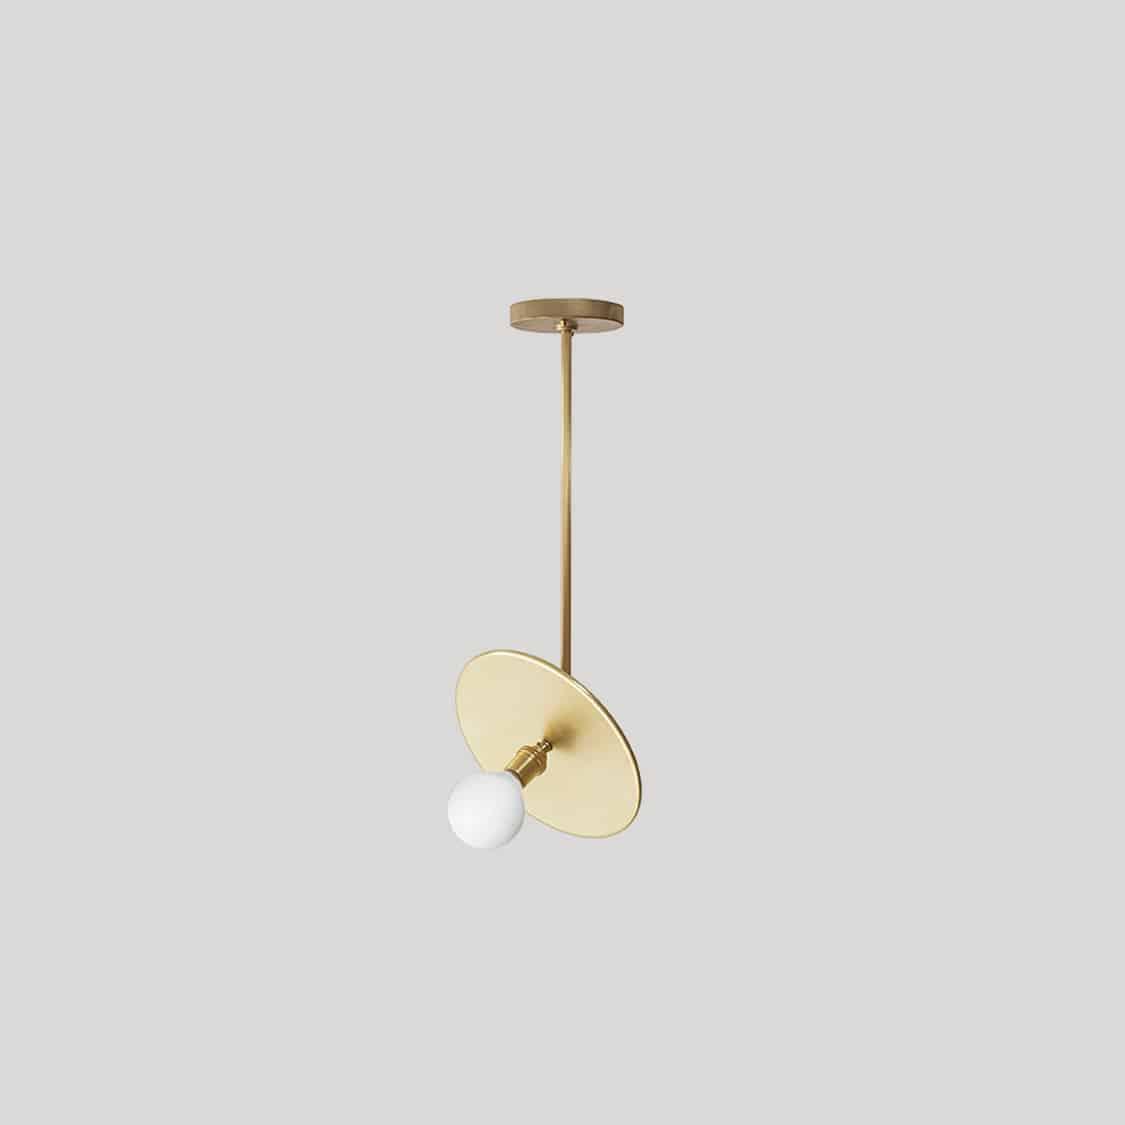 Brass-Pendant_Angled